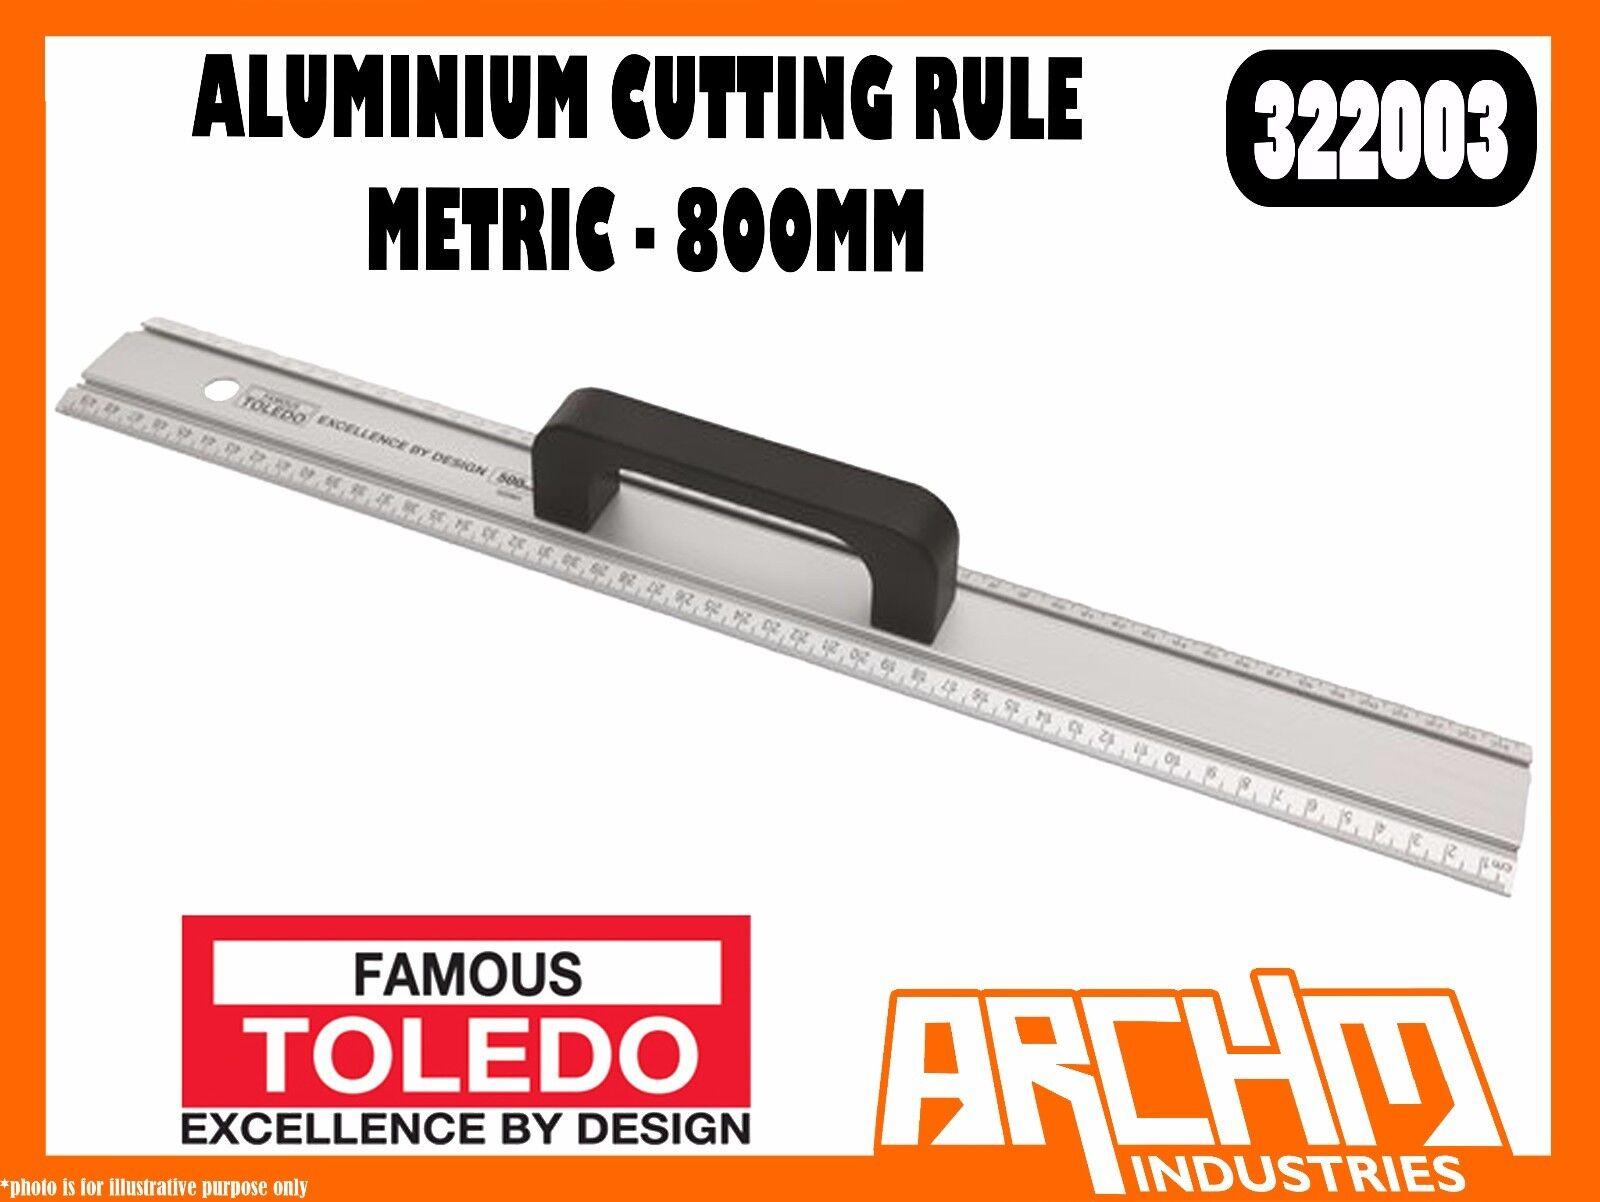 TOLEDO 322003 - ALUMINIUM CUTTING RULE METRIC - 800MM - HANDLE LIGHTWEIGHT